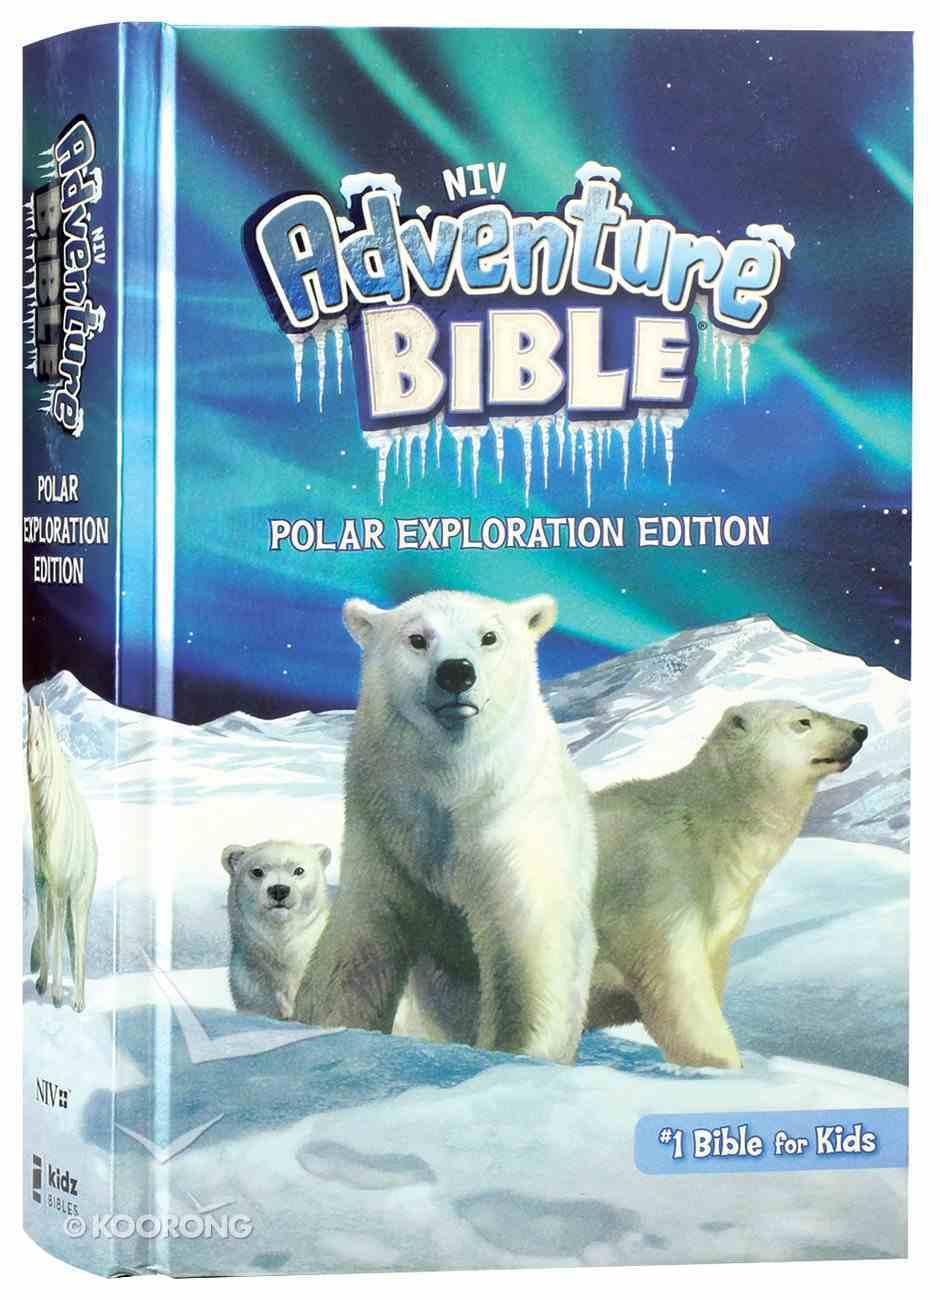 NIV Adventure Bible Polar Exploration Edition Full Color (Black Letter Edition) Hardback